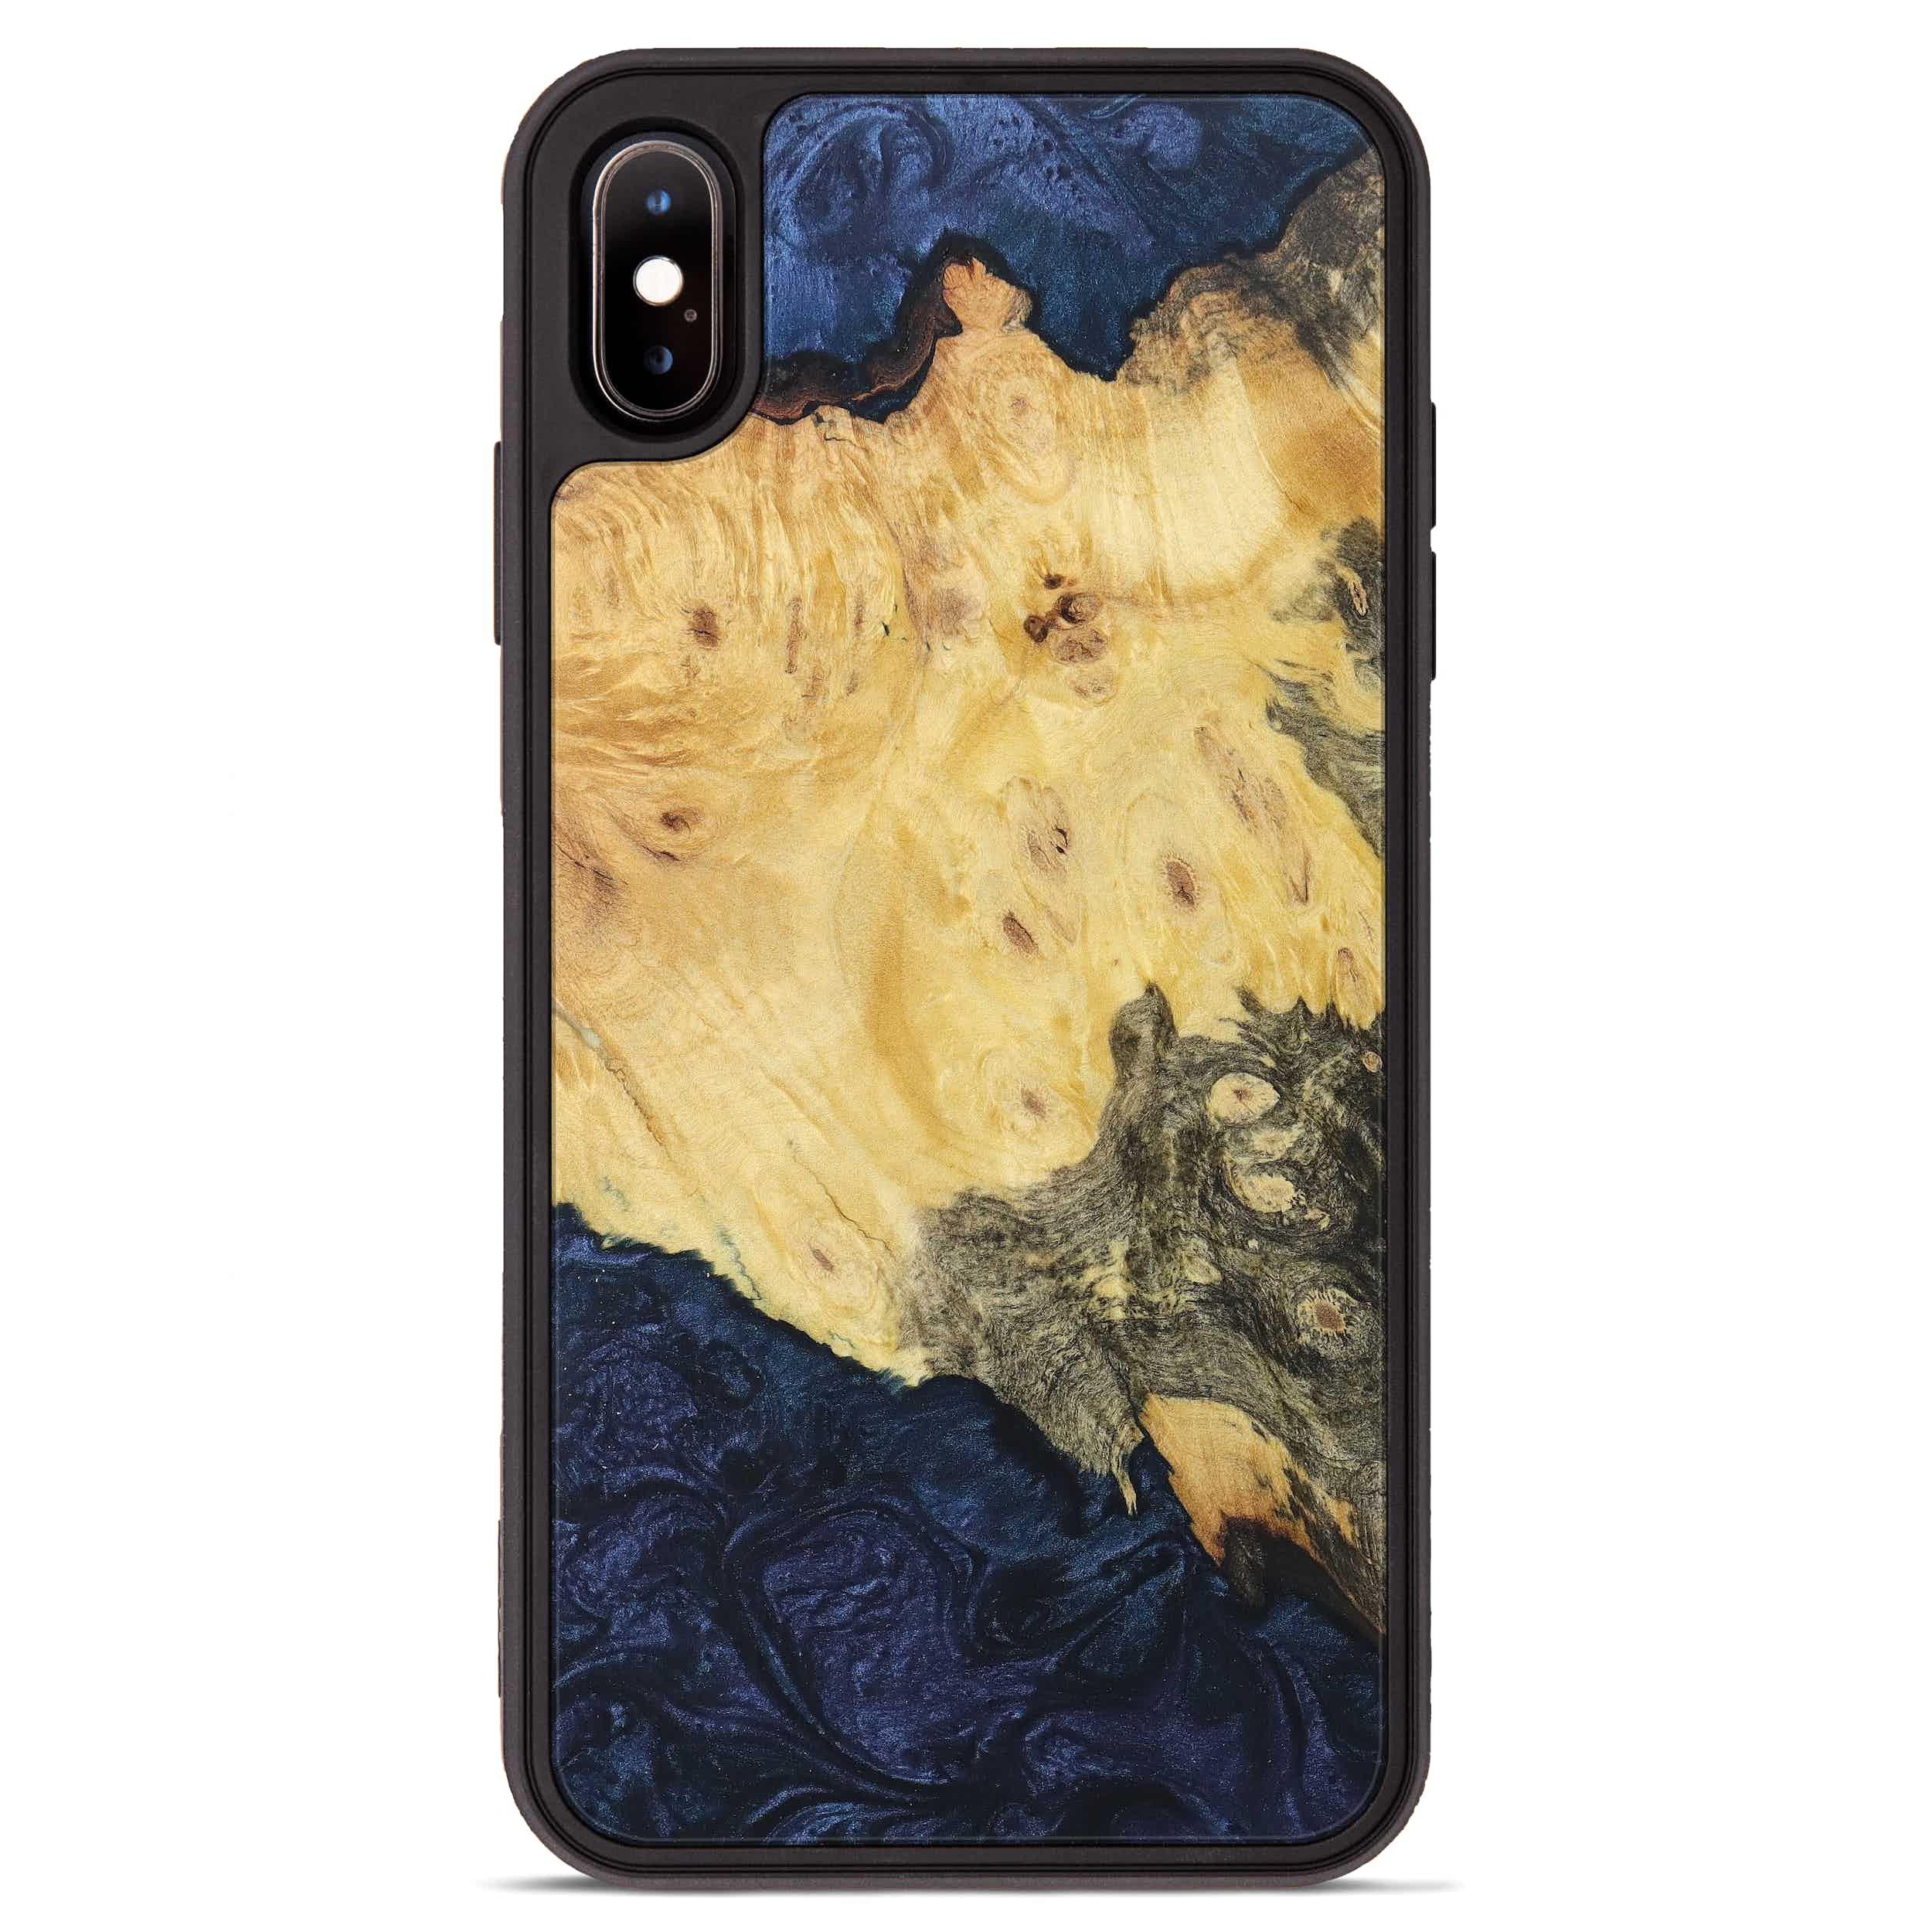 iPhone Xs Max Wood+Resin Phone Case - Zohar (Dark Blue, 394980)